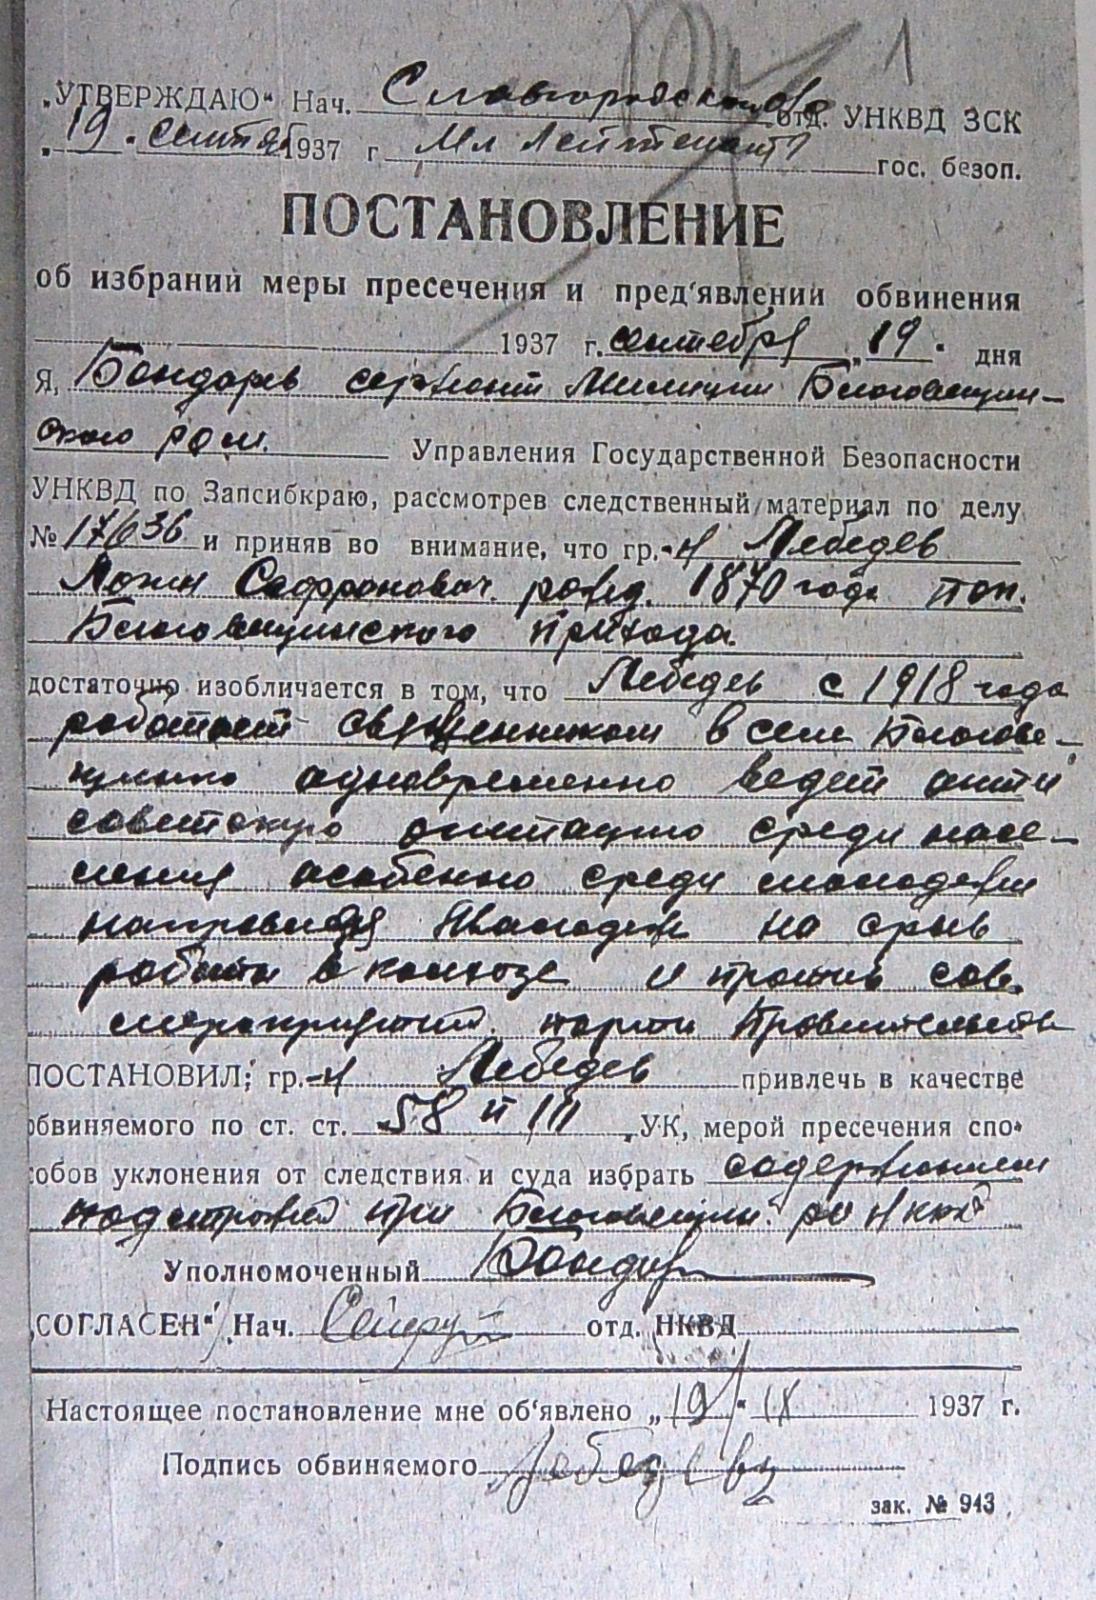 Логин Сафронович Лебедев, иерей